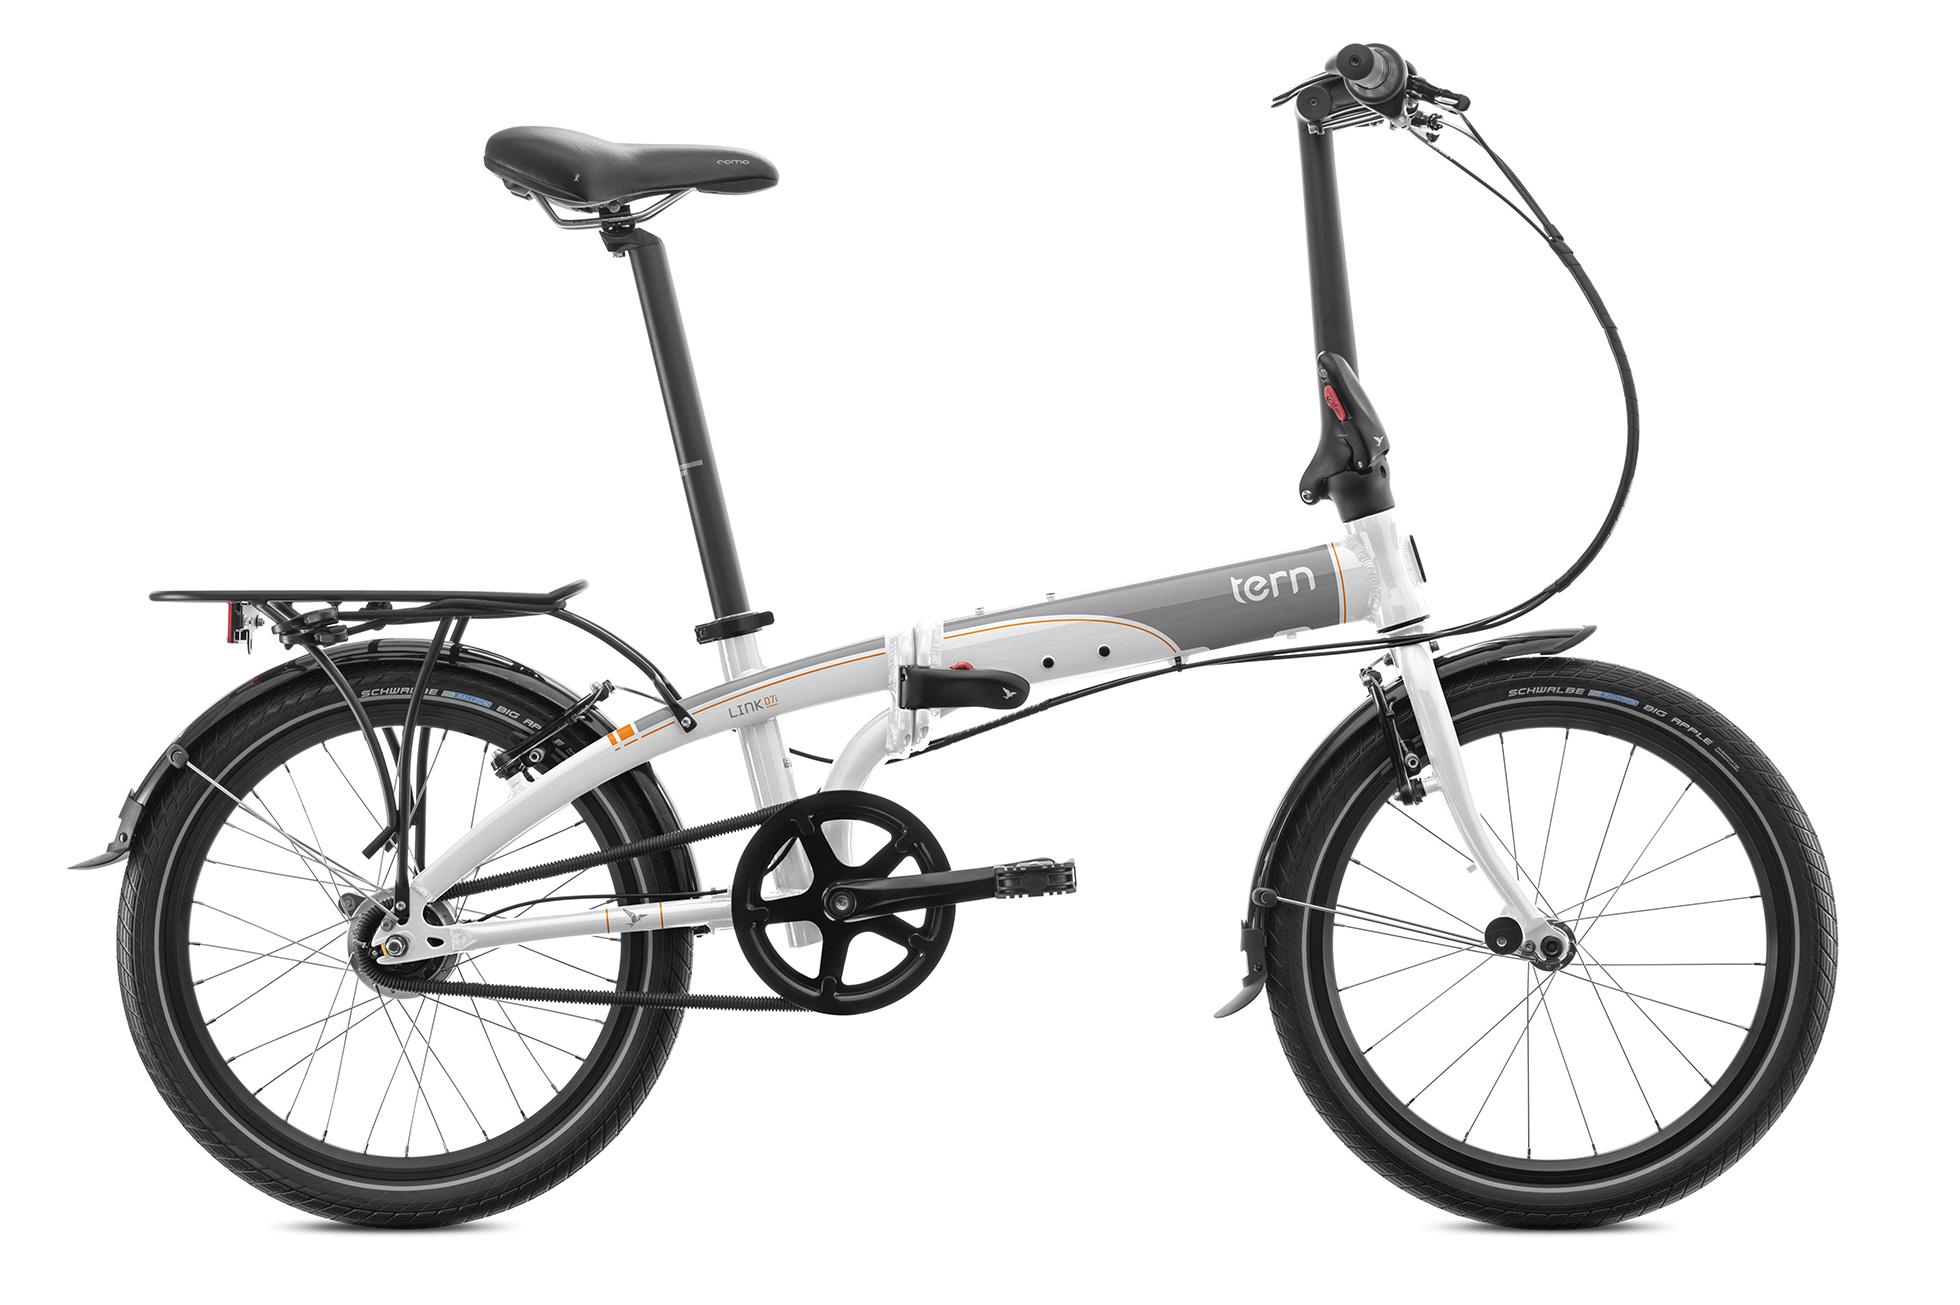 tern link d7i  Link D7i | Tern Folding Bikes | Poland